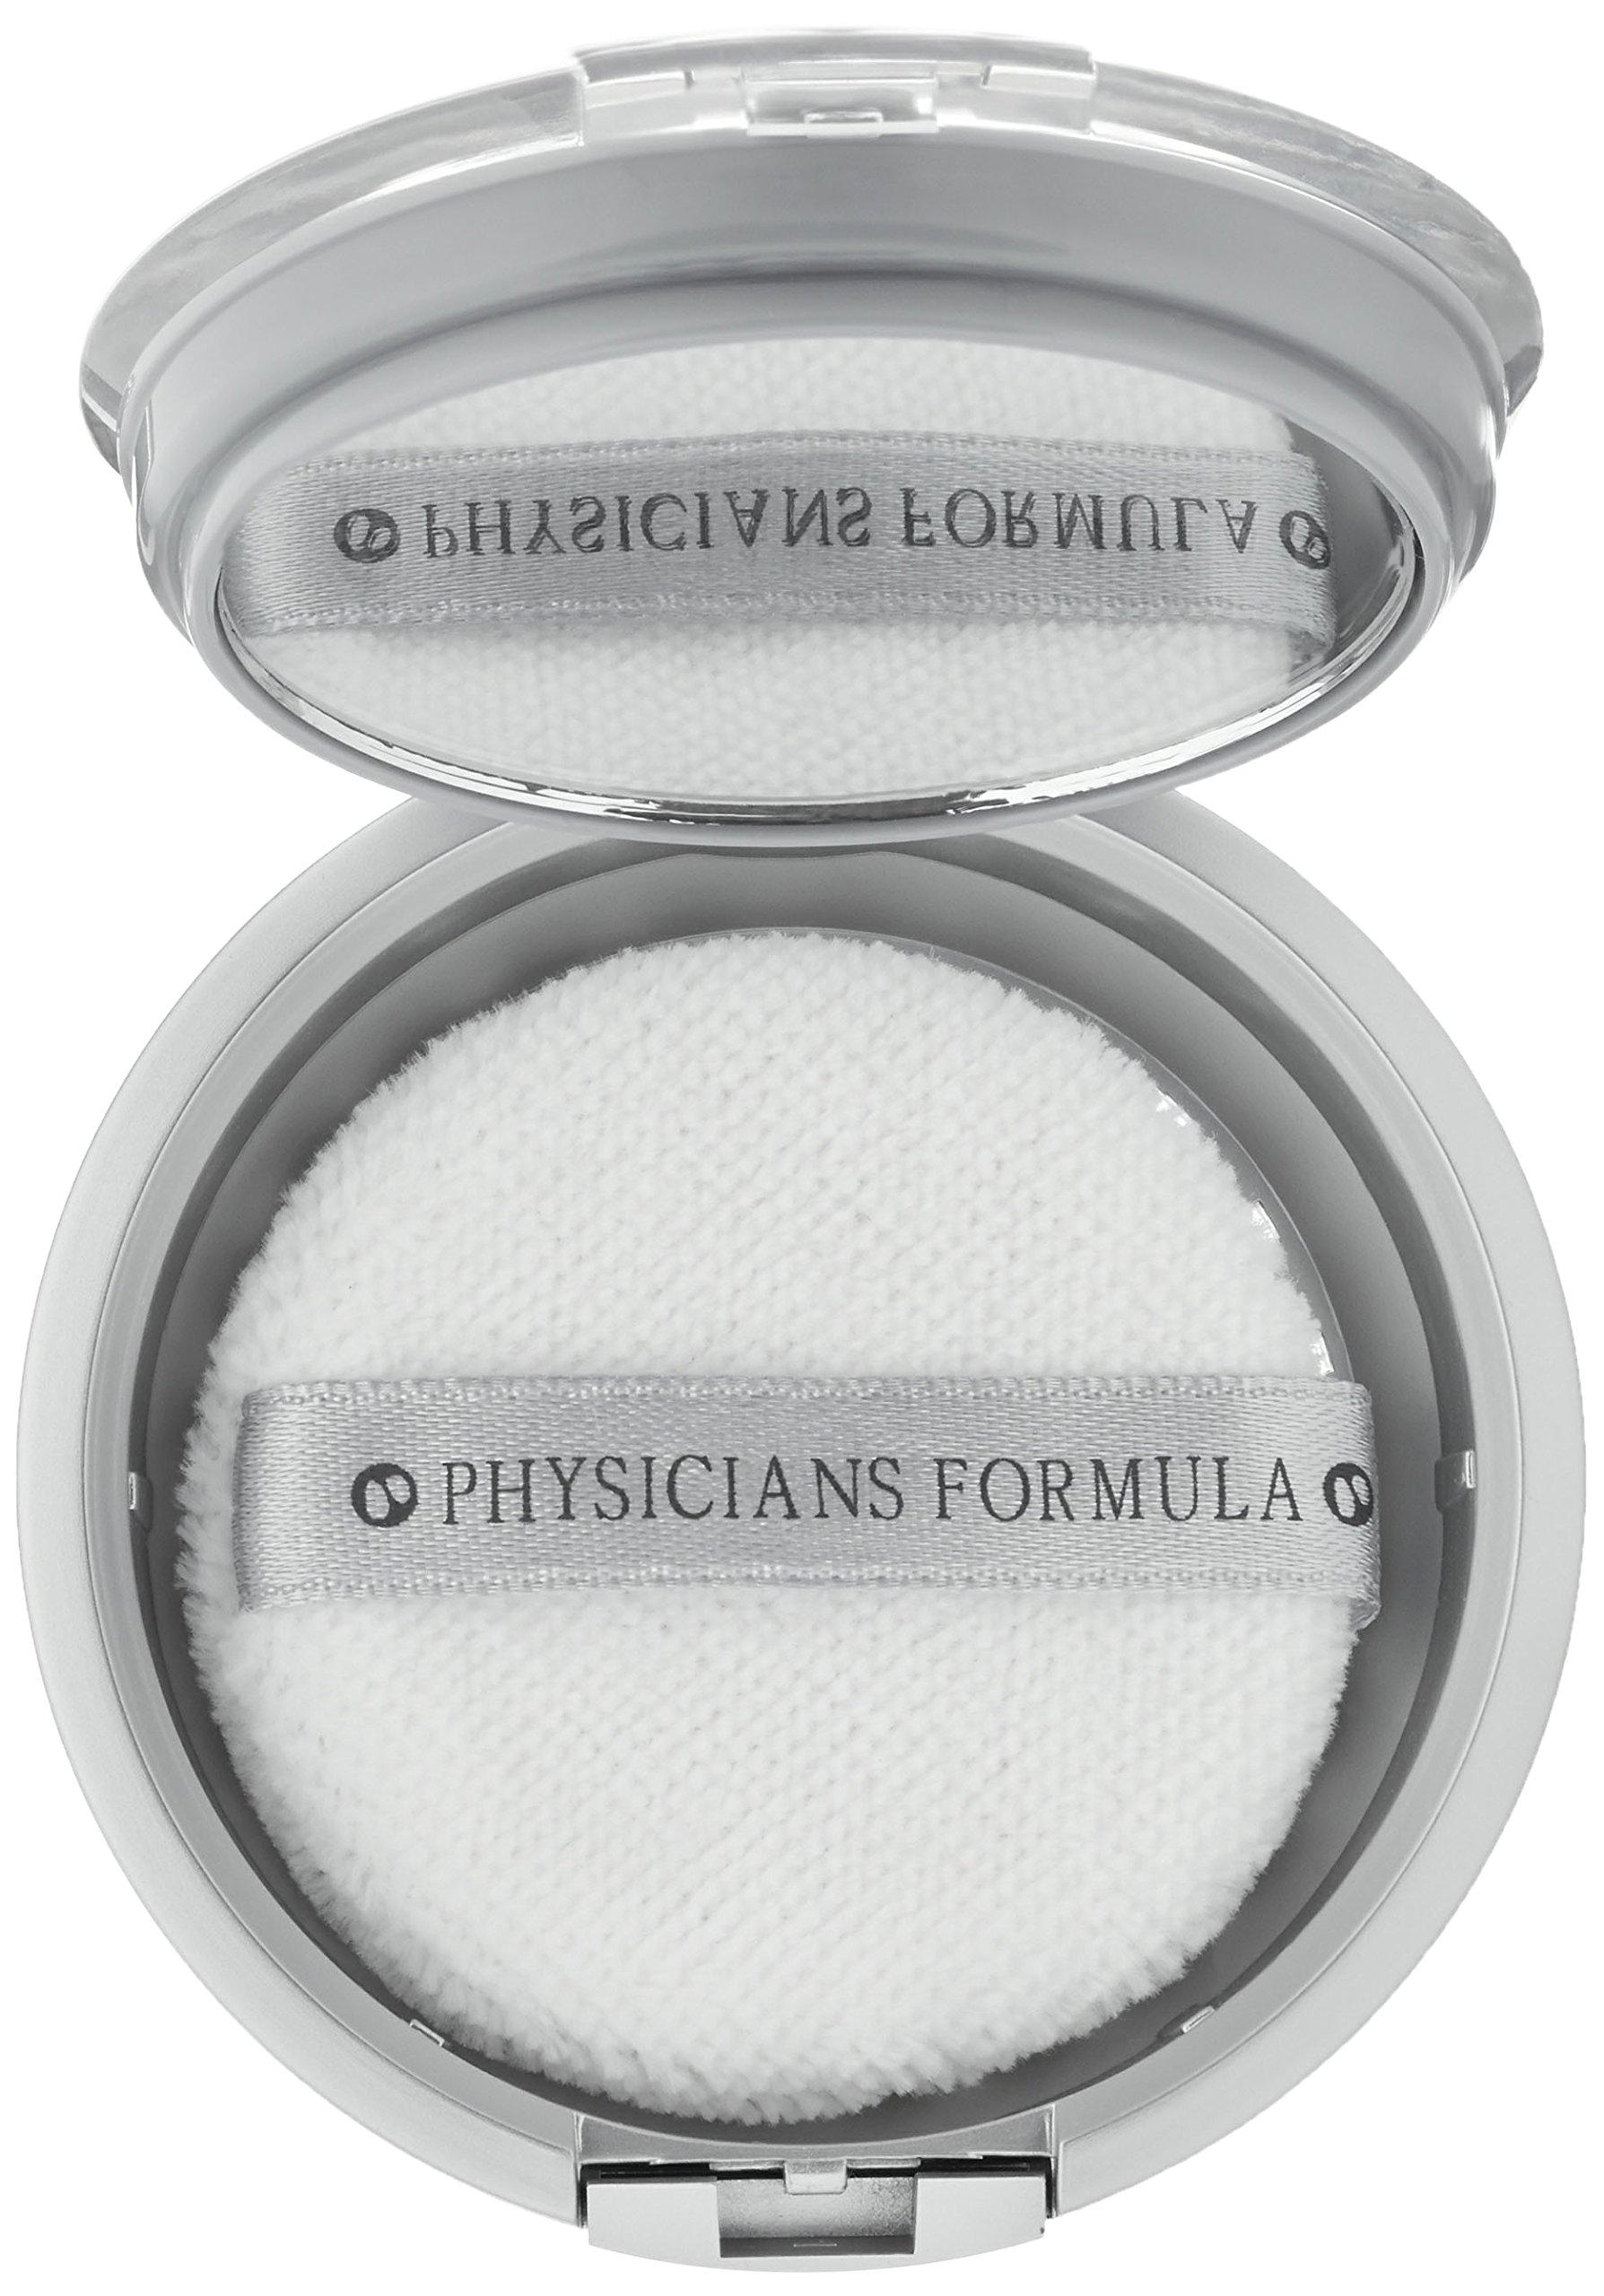 Physicians Formula Powder Palette Color Corrective Powders, Multi-colored Pressed Powder, Translucent, 0.3-Ounces by Physicians Formula (Image #9)